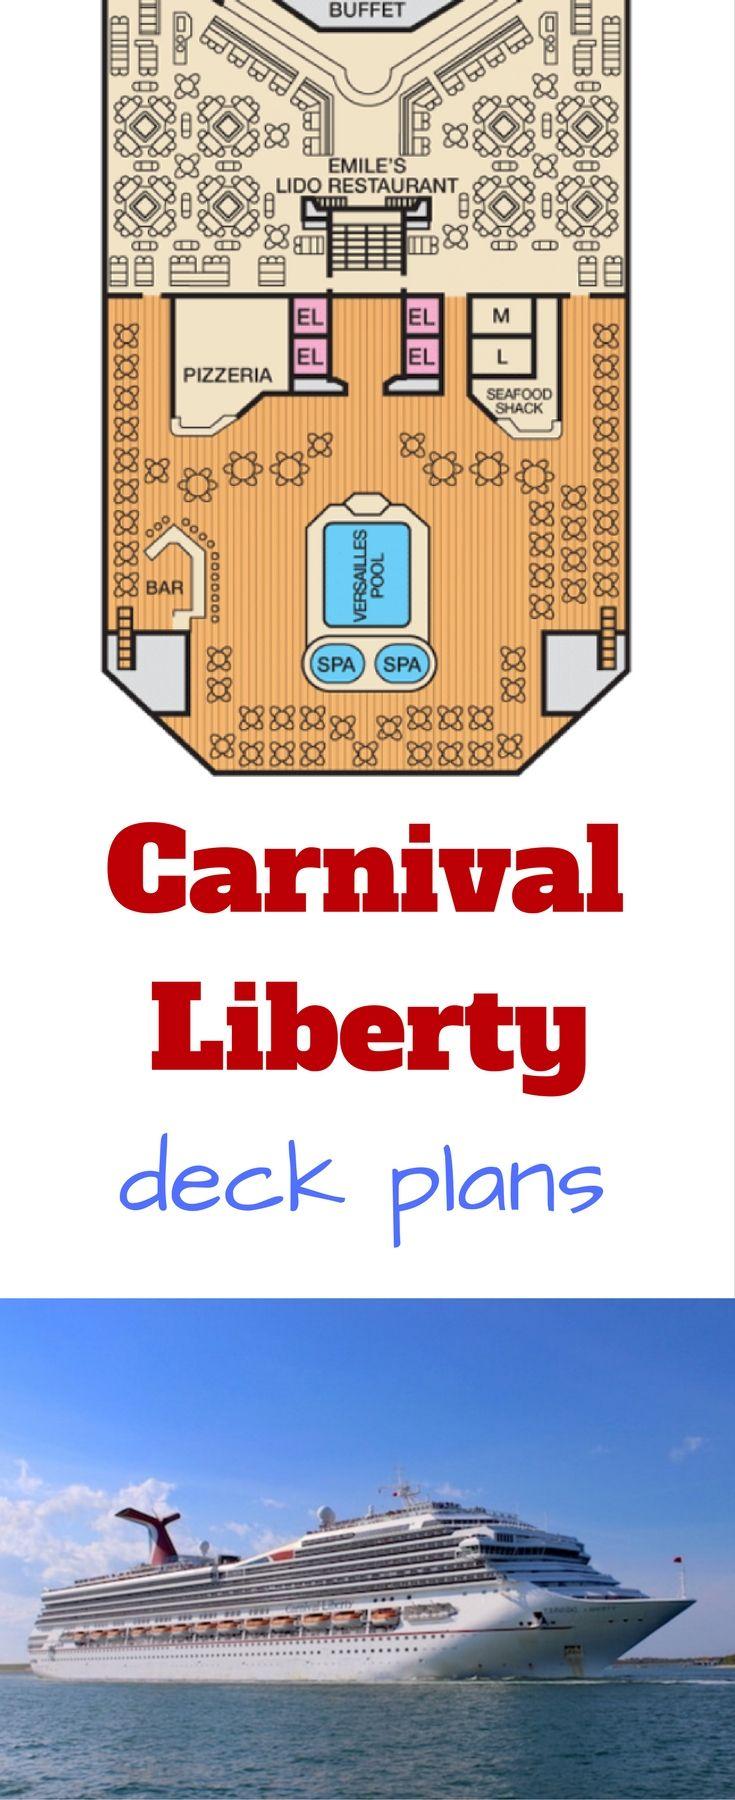 #carnival #ship #cruise carnival liberty cruise ship #vacation #travel deck plans #deckplans